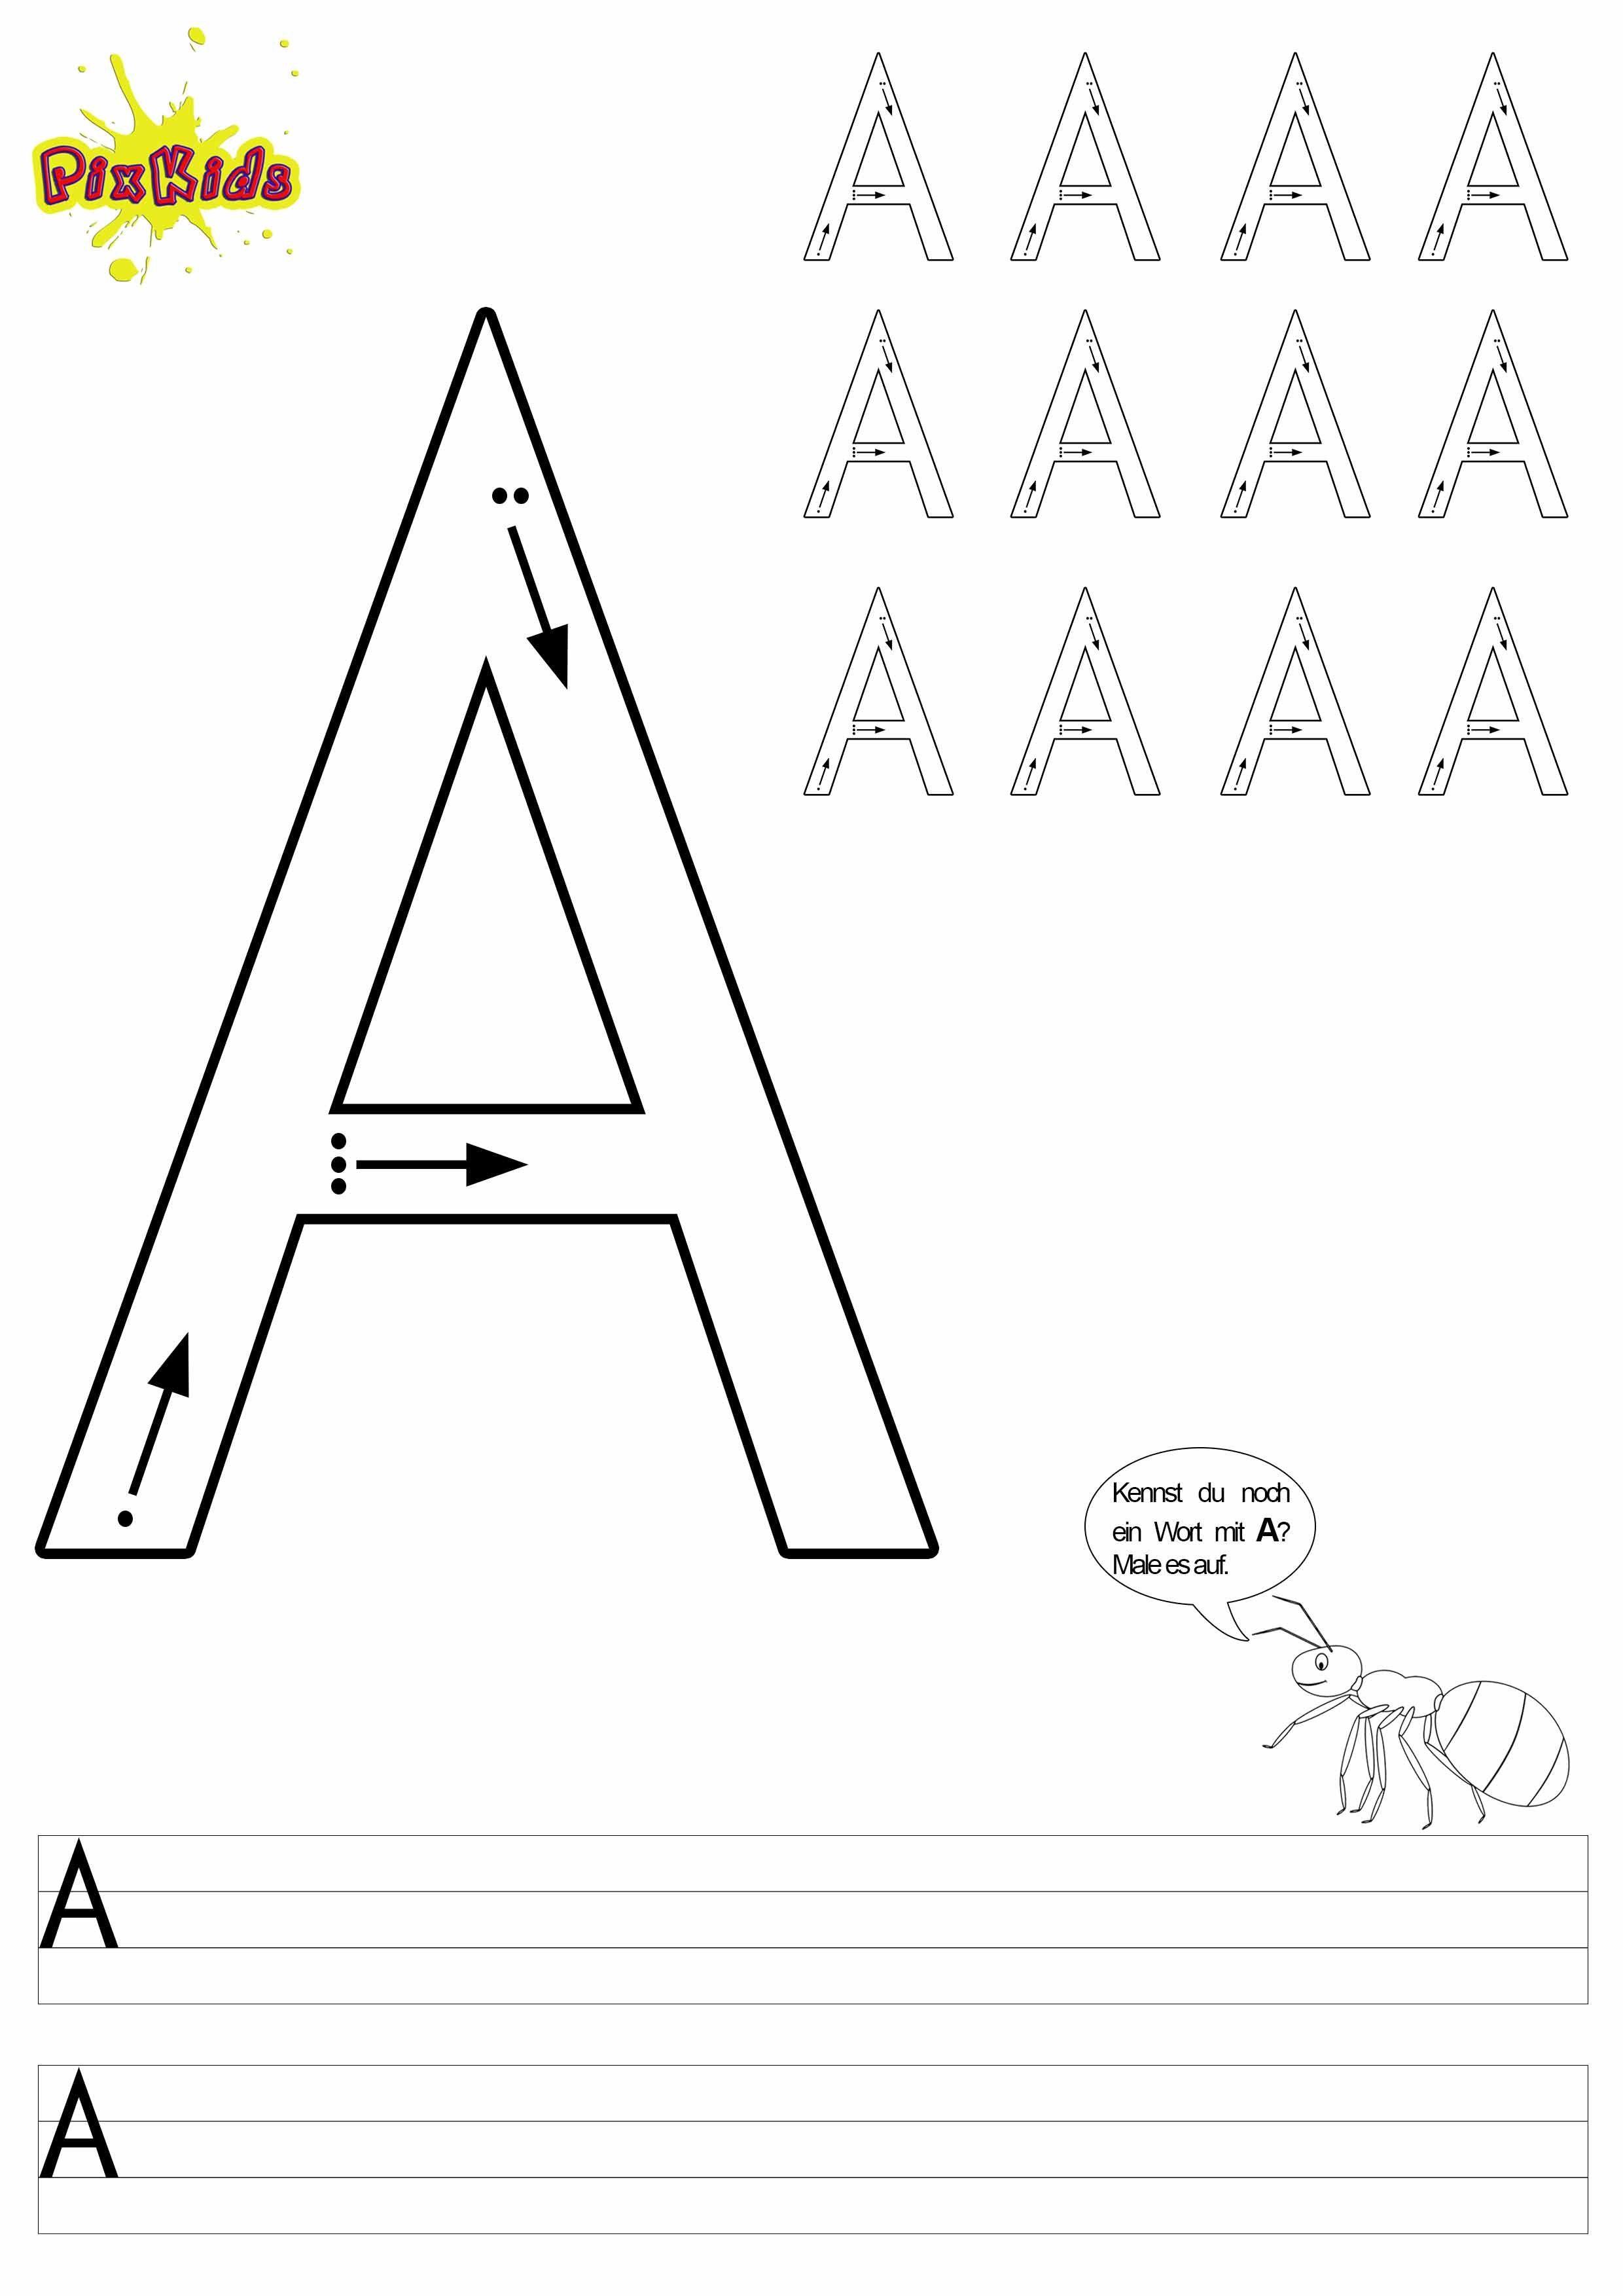 buchstaben schreiben lernen arbeitsbl tter buchstabe 2480 3508 kirjainkivaa pinterest. Black Bedroom Furniture Sets. Home Design Ideas